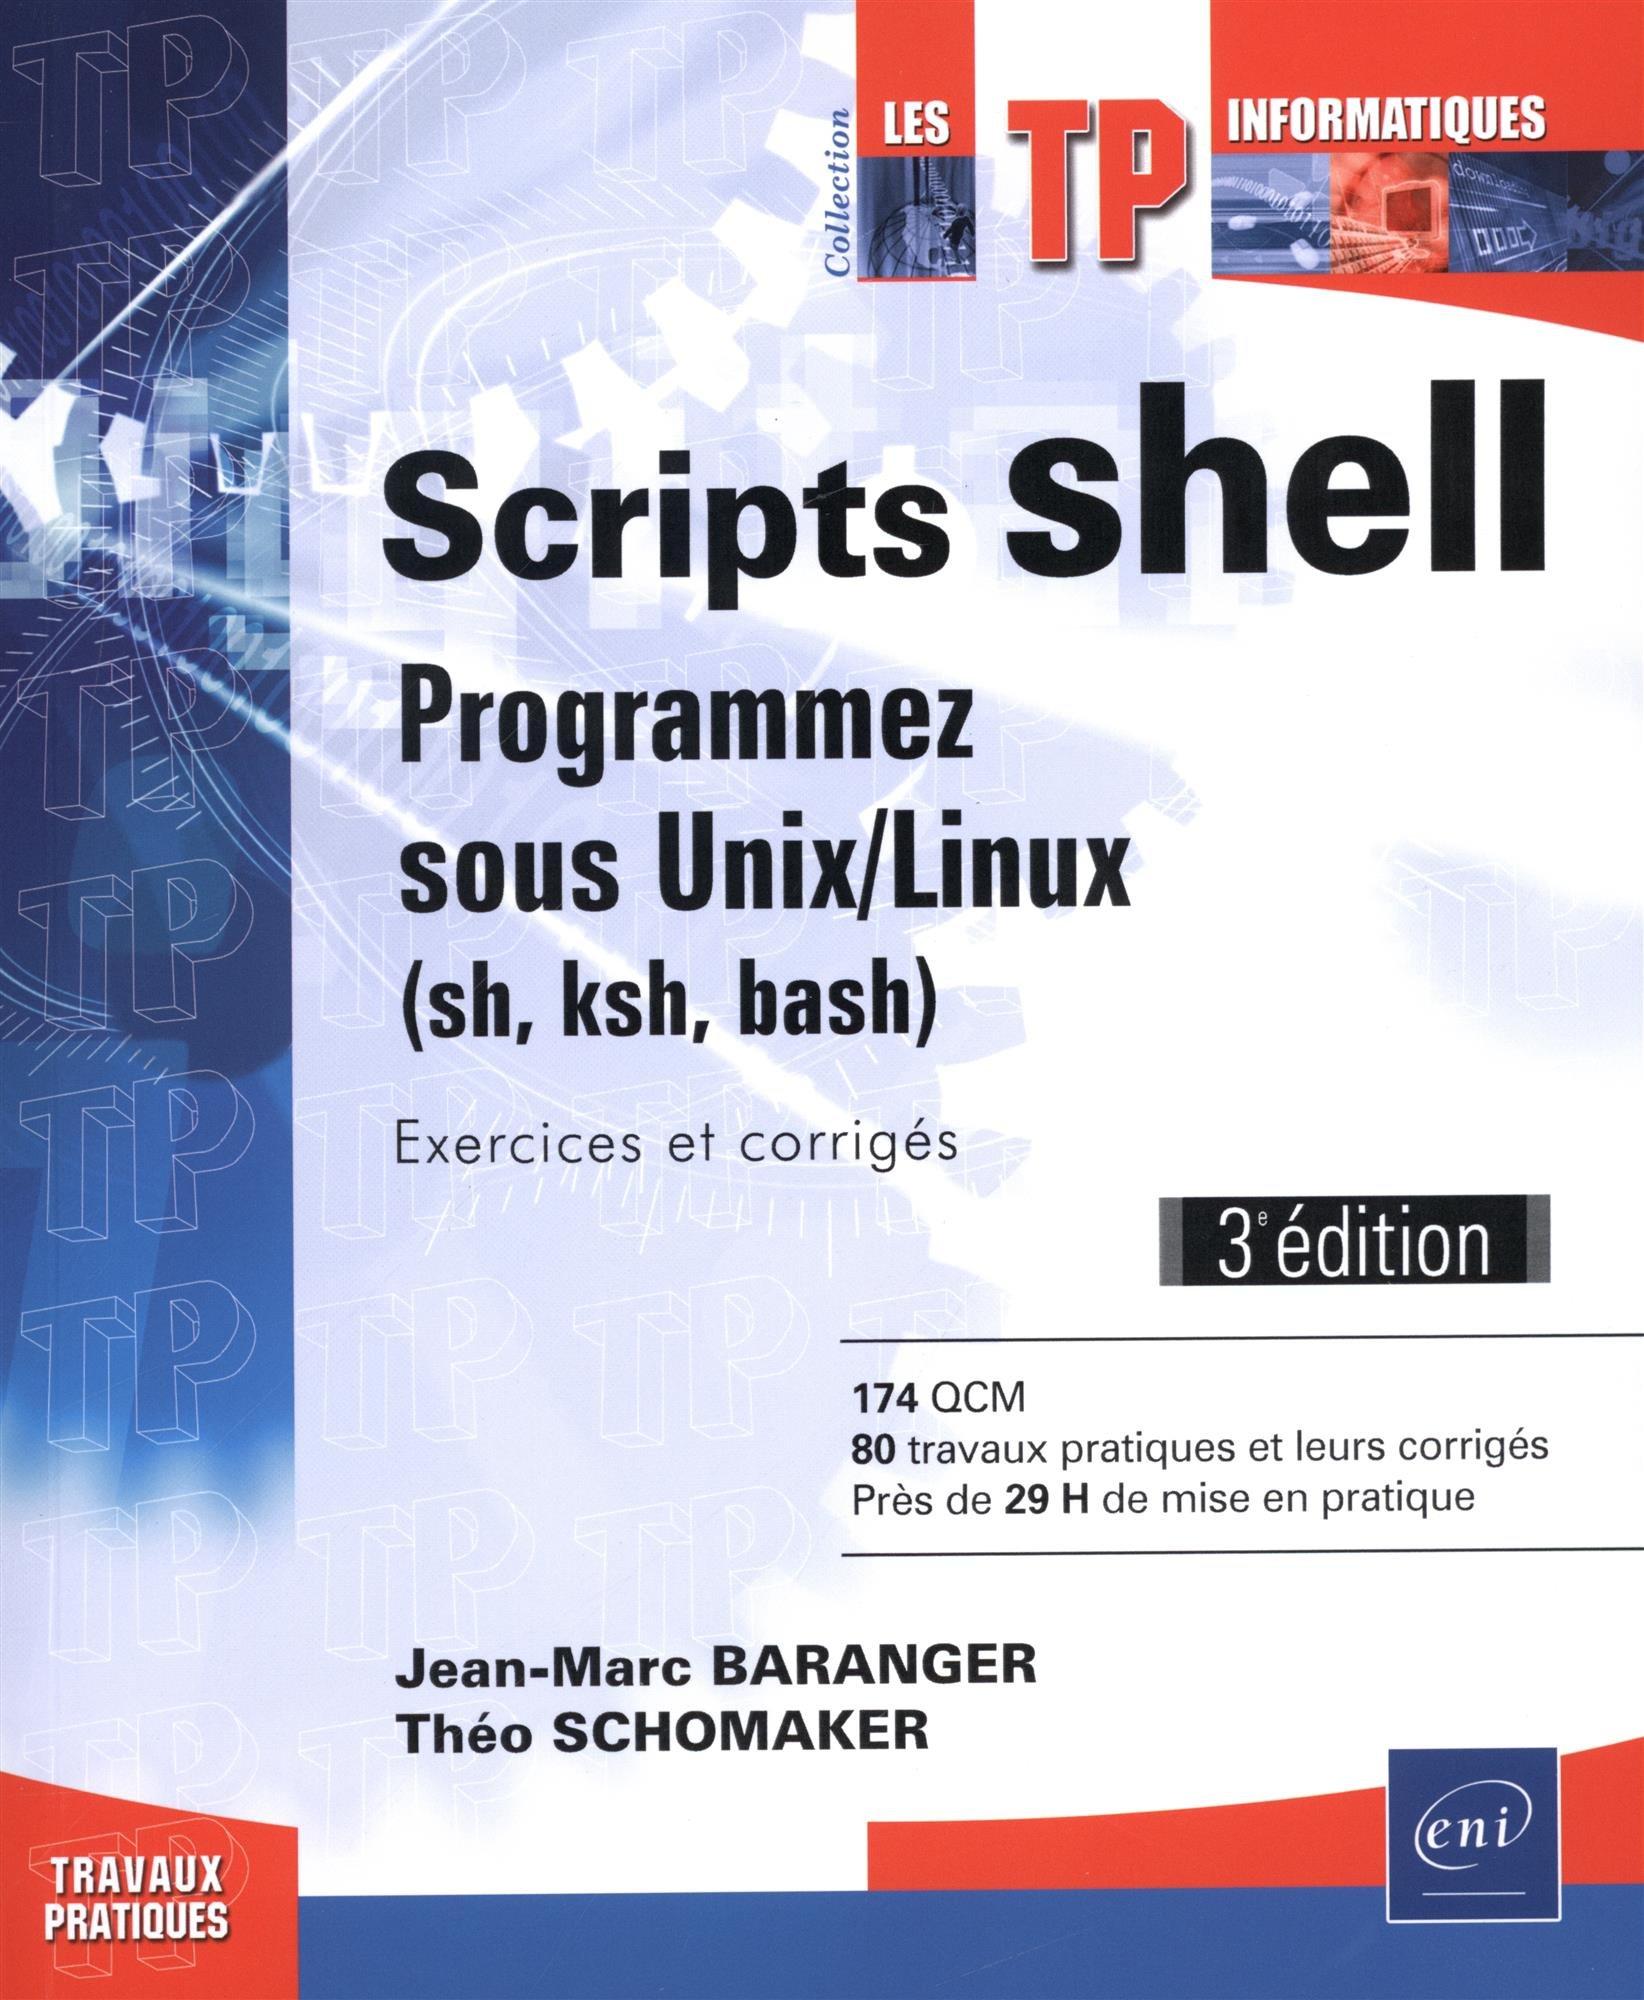 Scripts shell - Programmez sous Unix/Linux (sh, ksh, bash